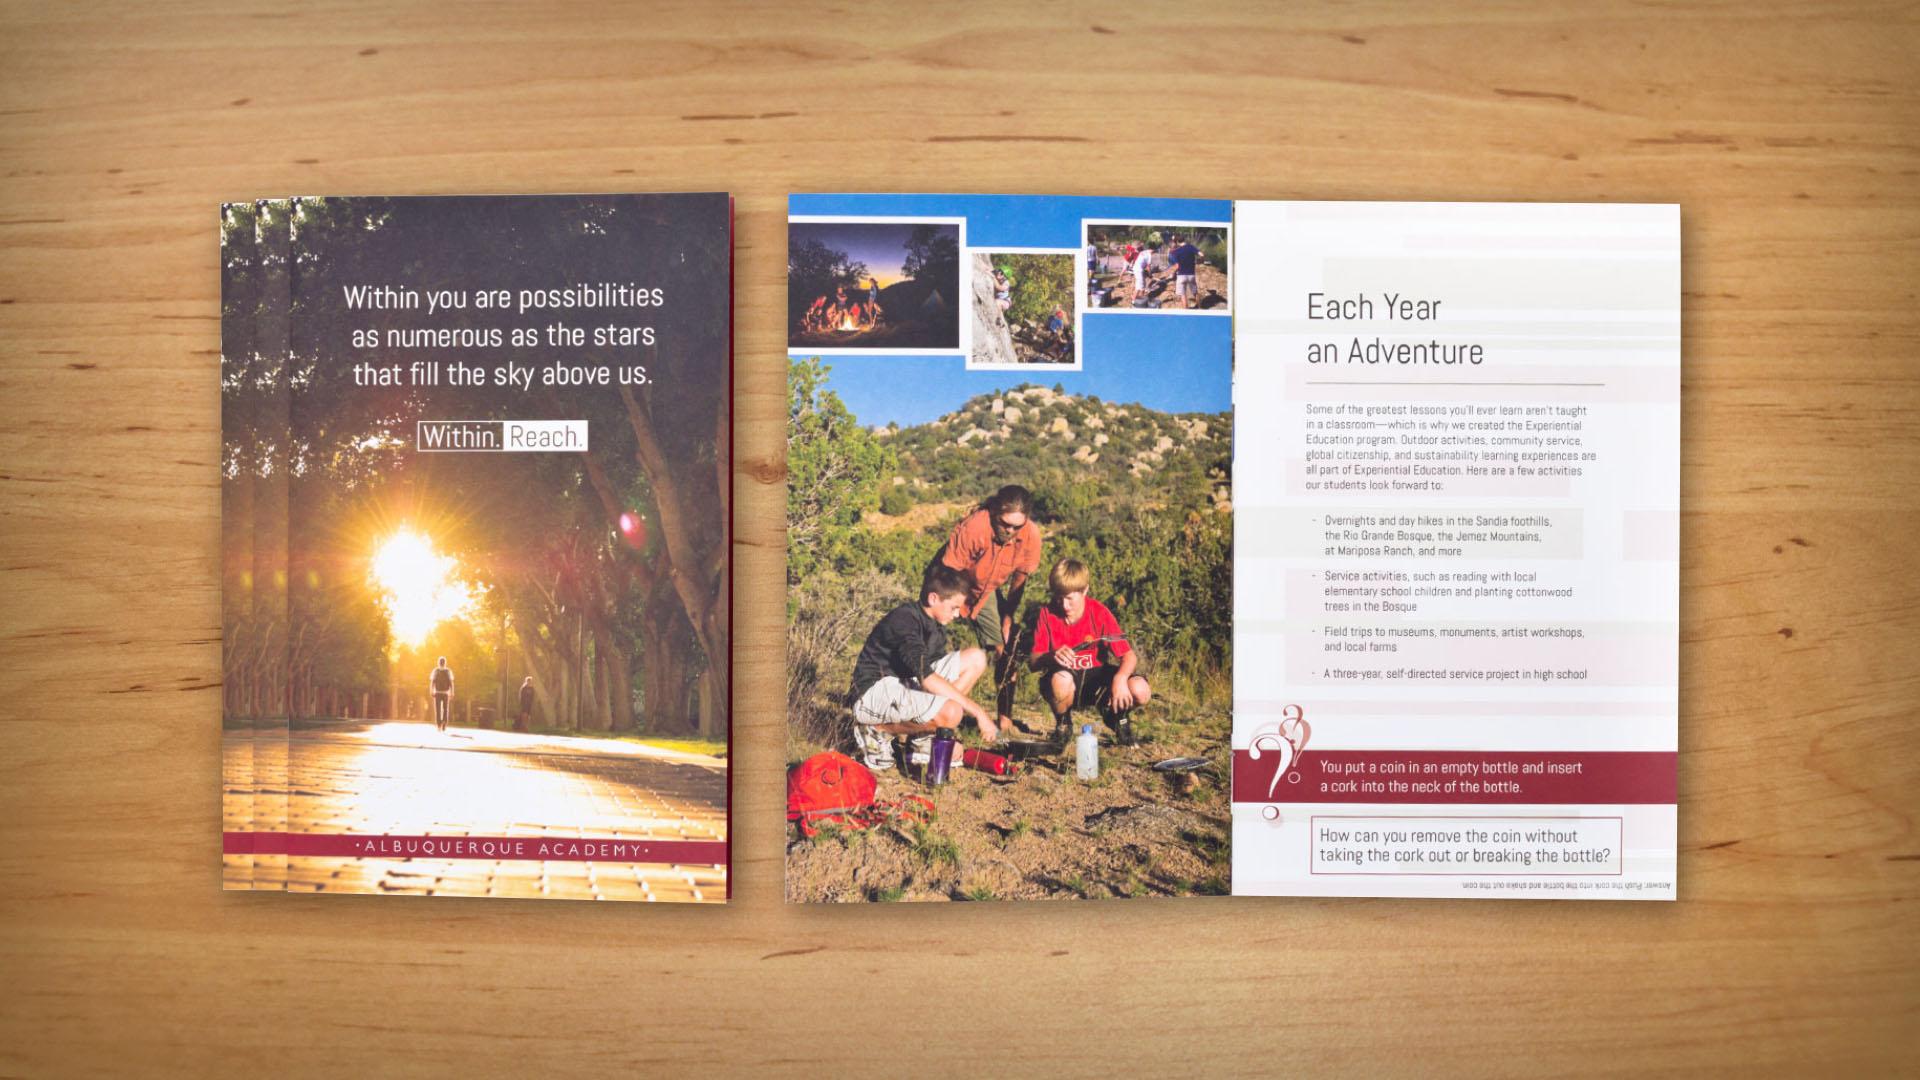 Albuquerque-Academy-Branding-Marketing-Admissions-Campaign-Mini-Viewbook-4.jpg